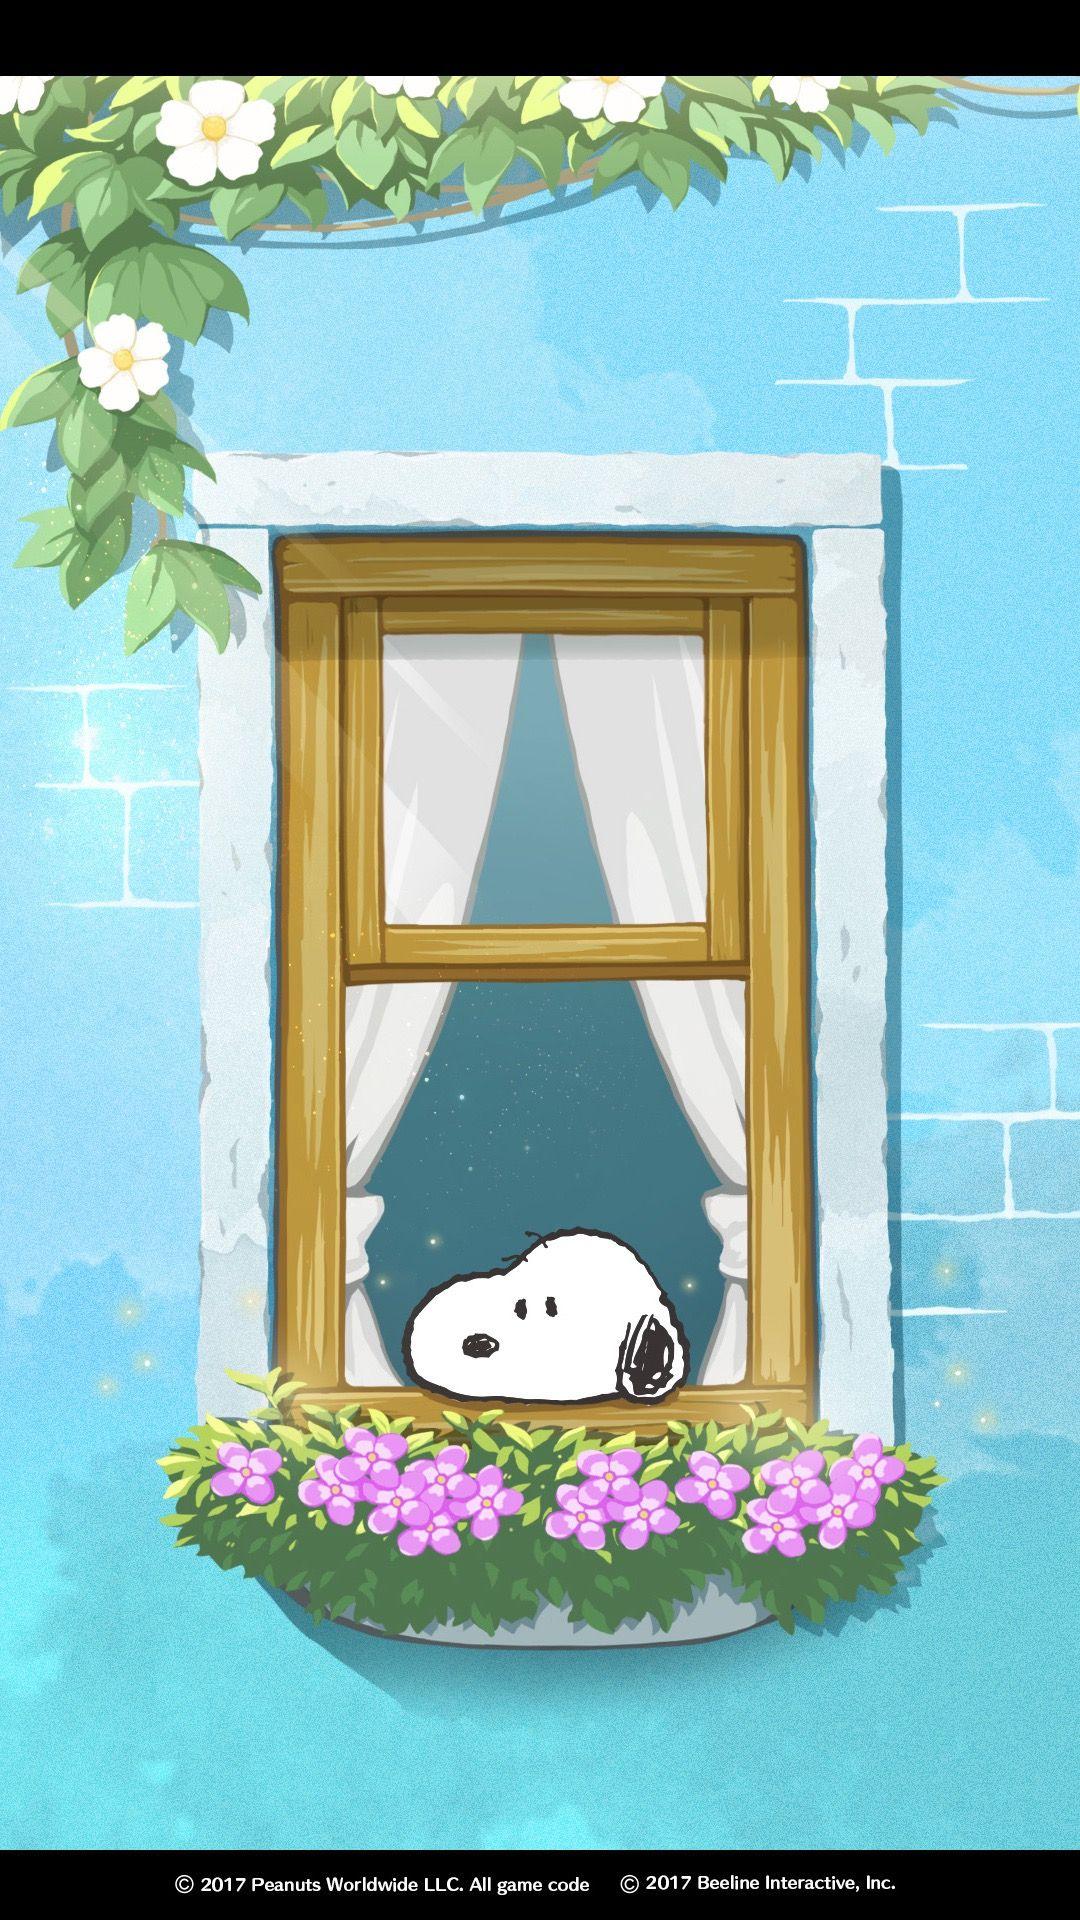 Snoopy スヌーピー 壁紙 窓